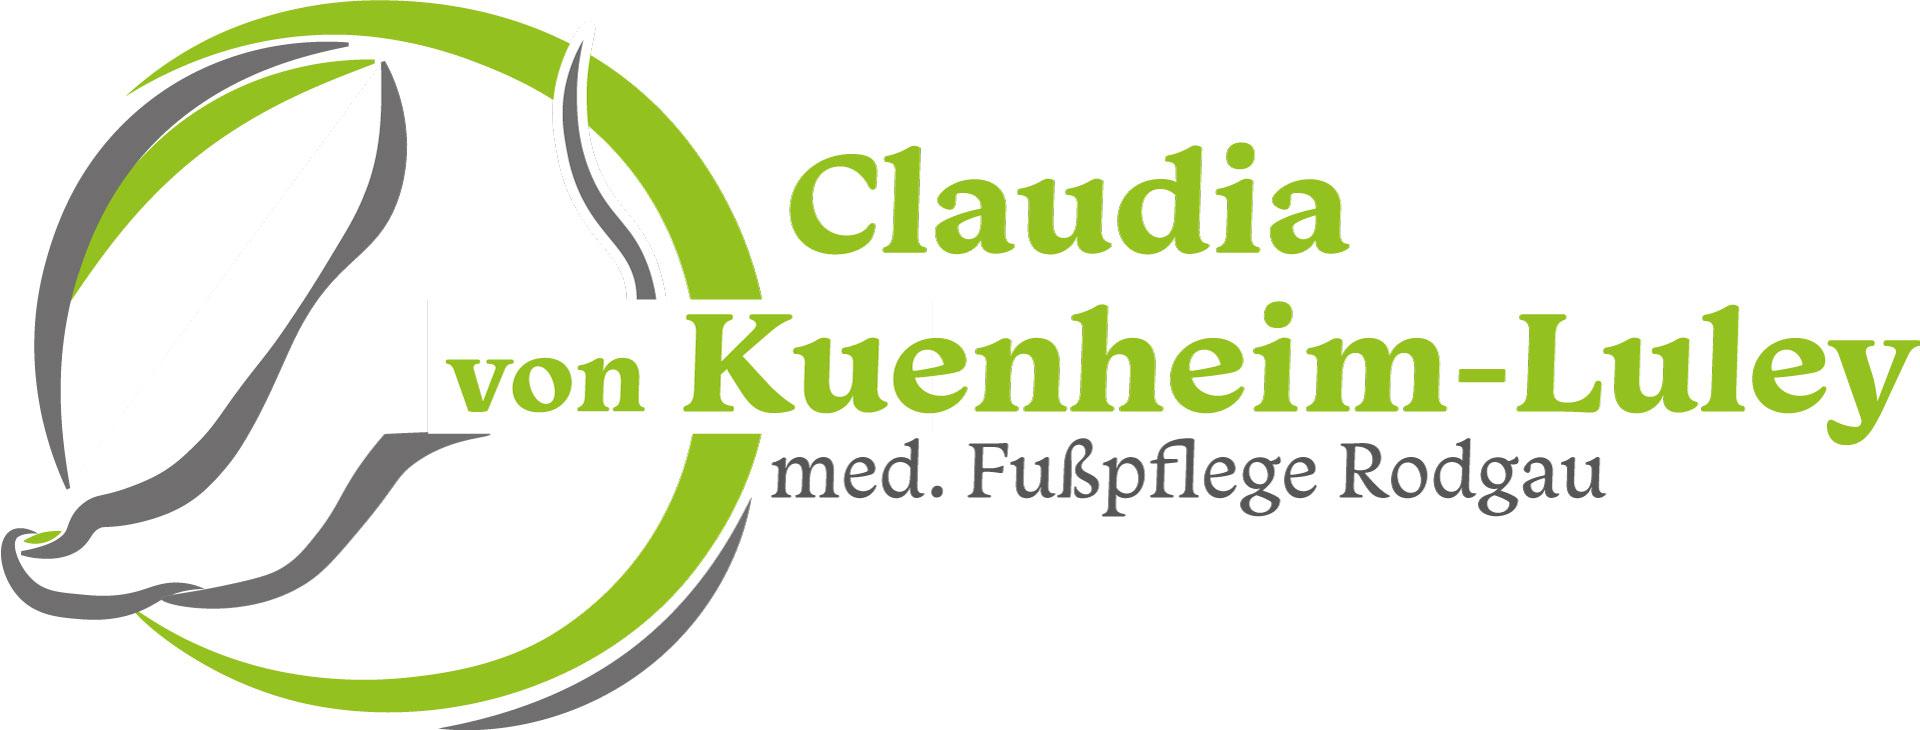 Fusspflege Rodgau Claudia Kuenheim-Luley